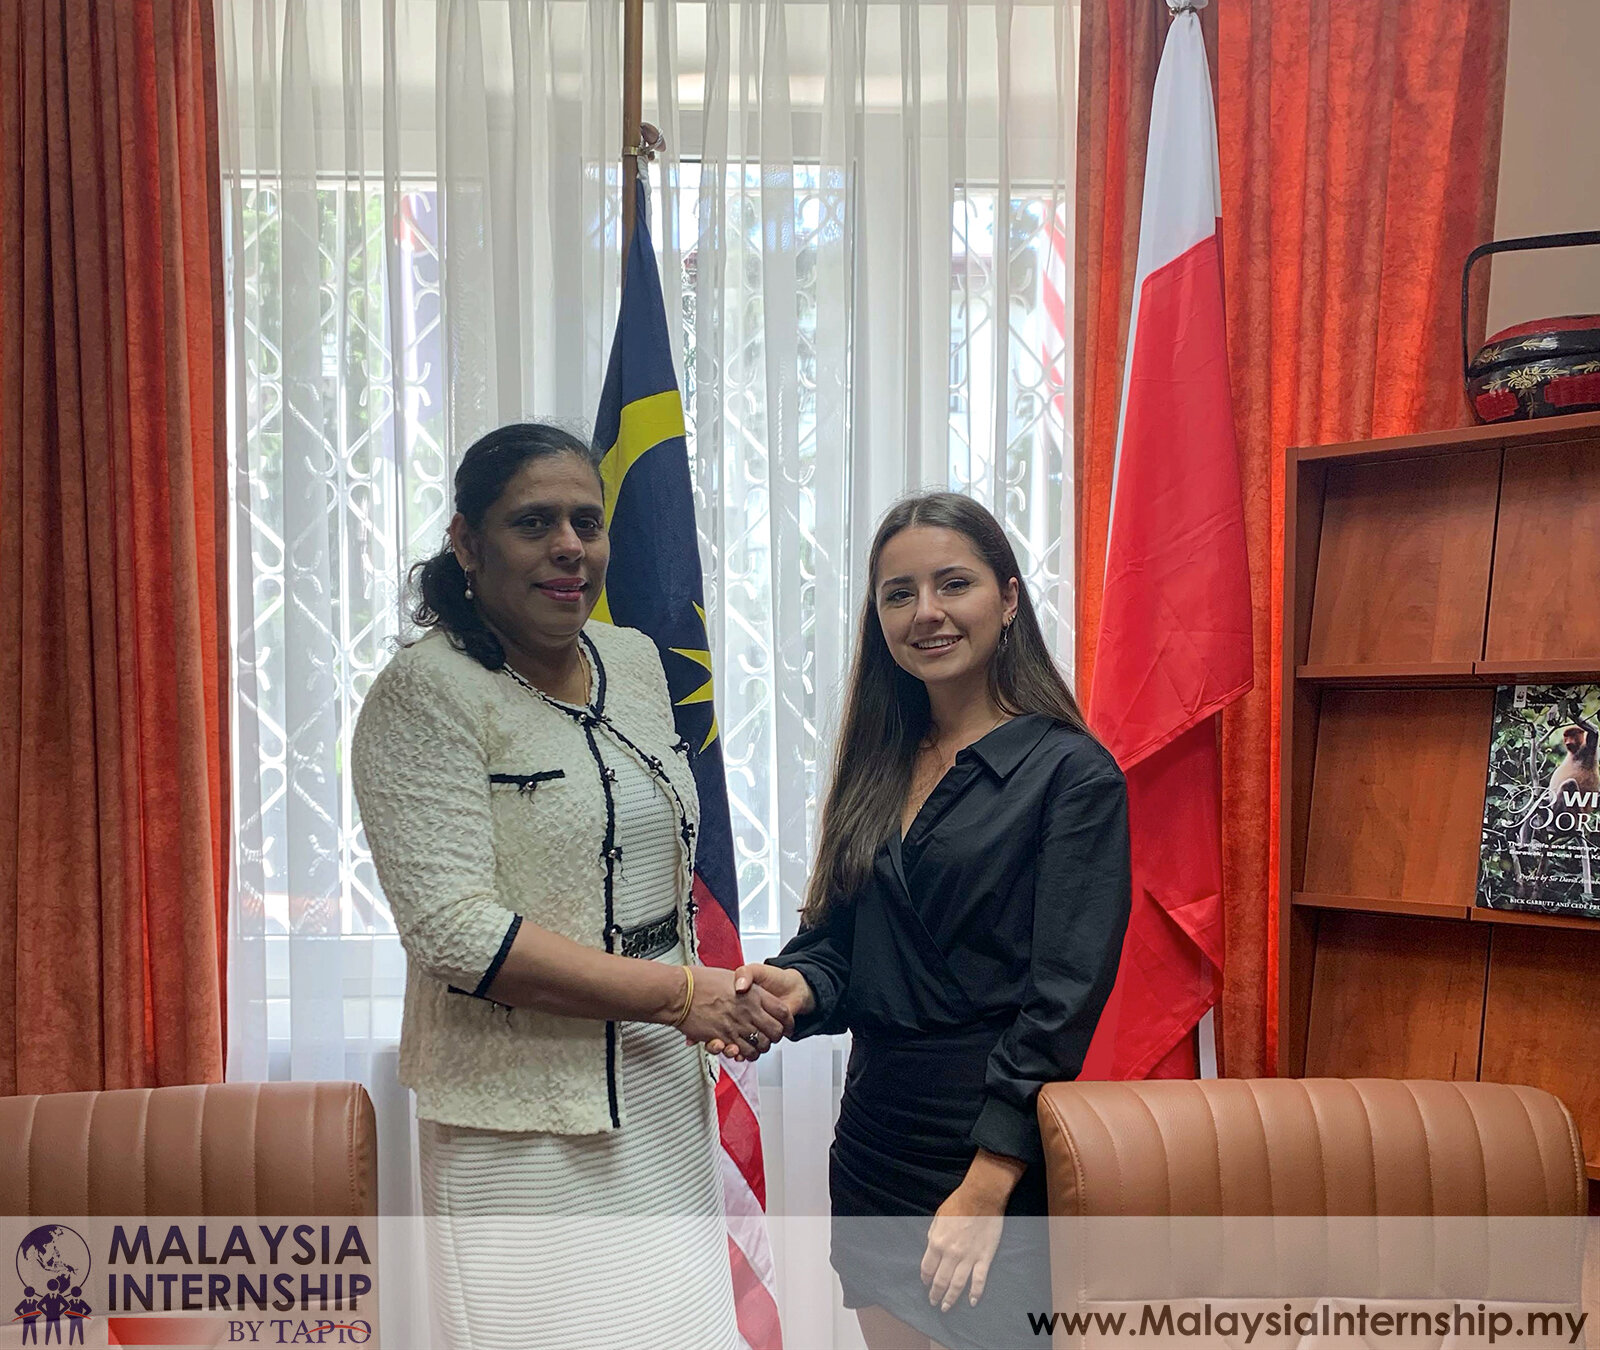 20200727 - Meeting with Ambassador of Malaysia to Poland